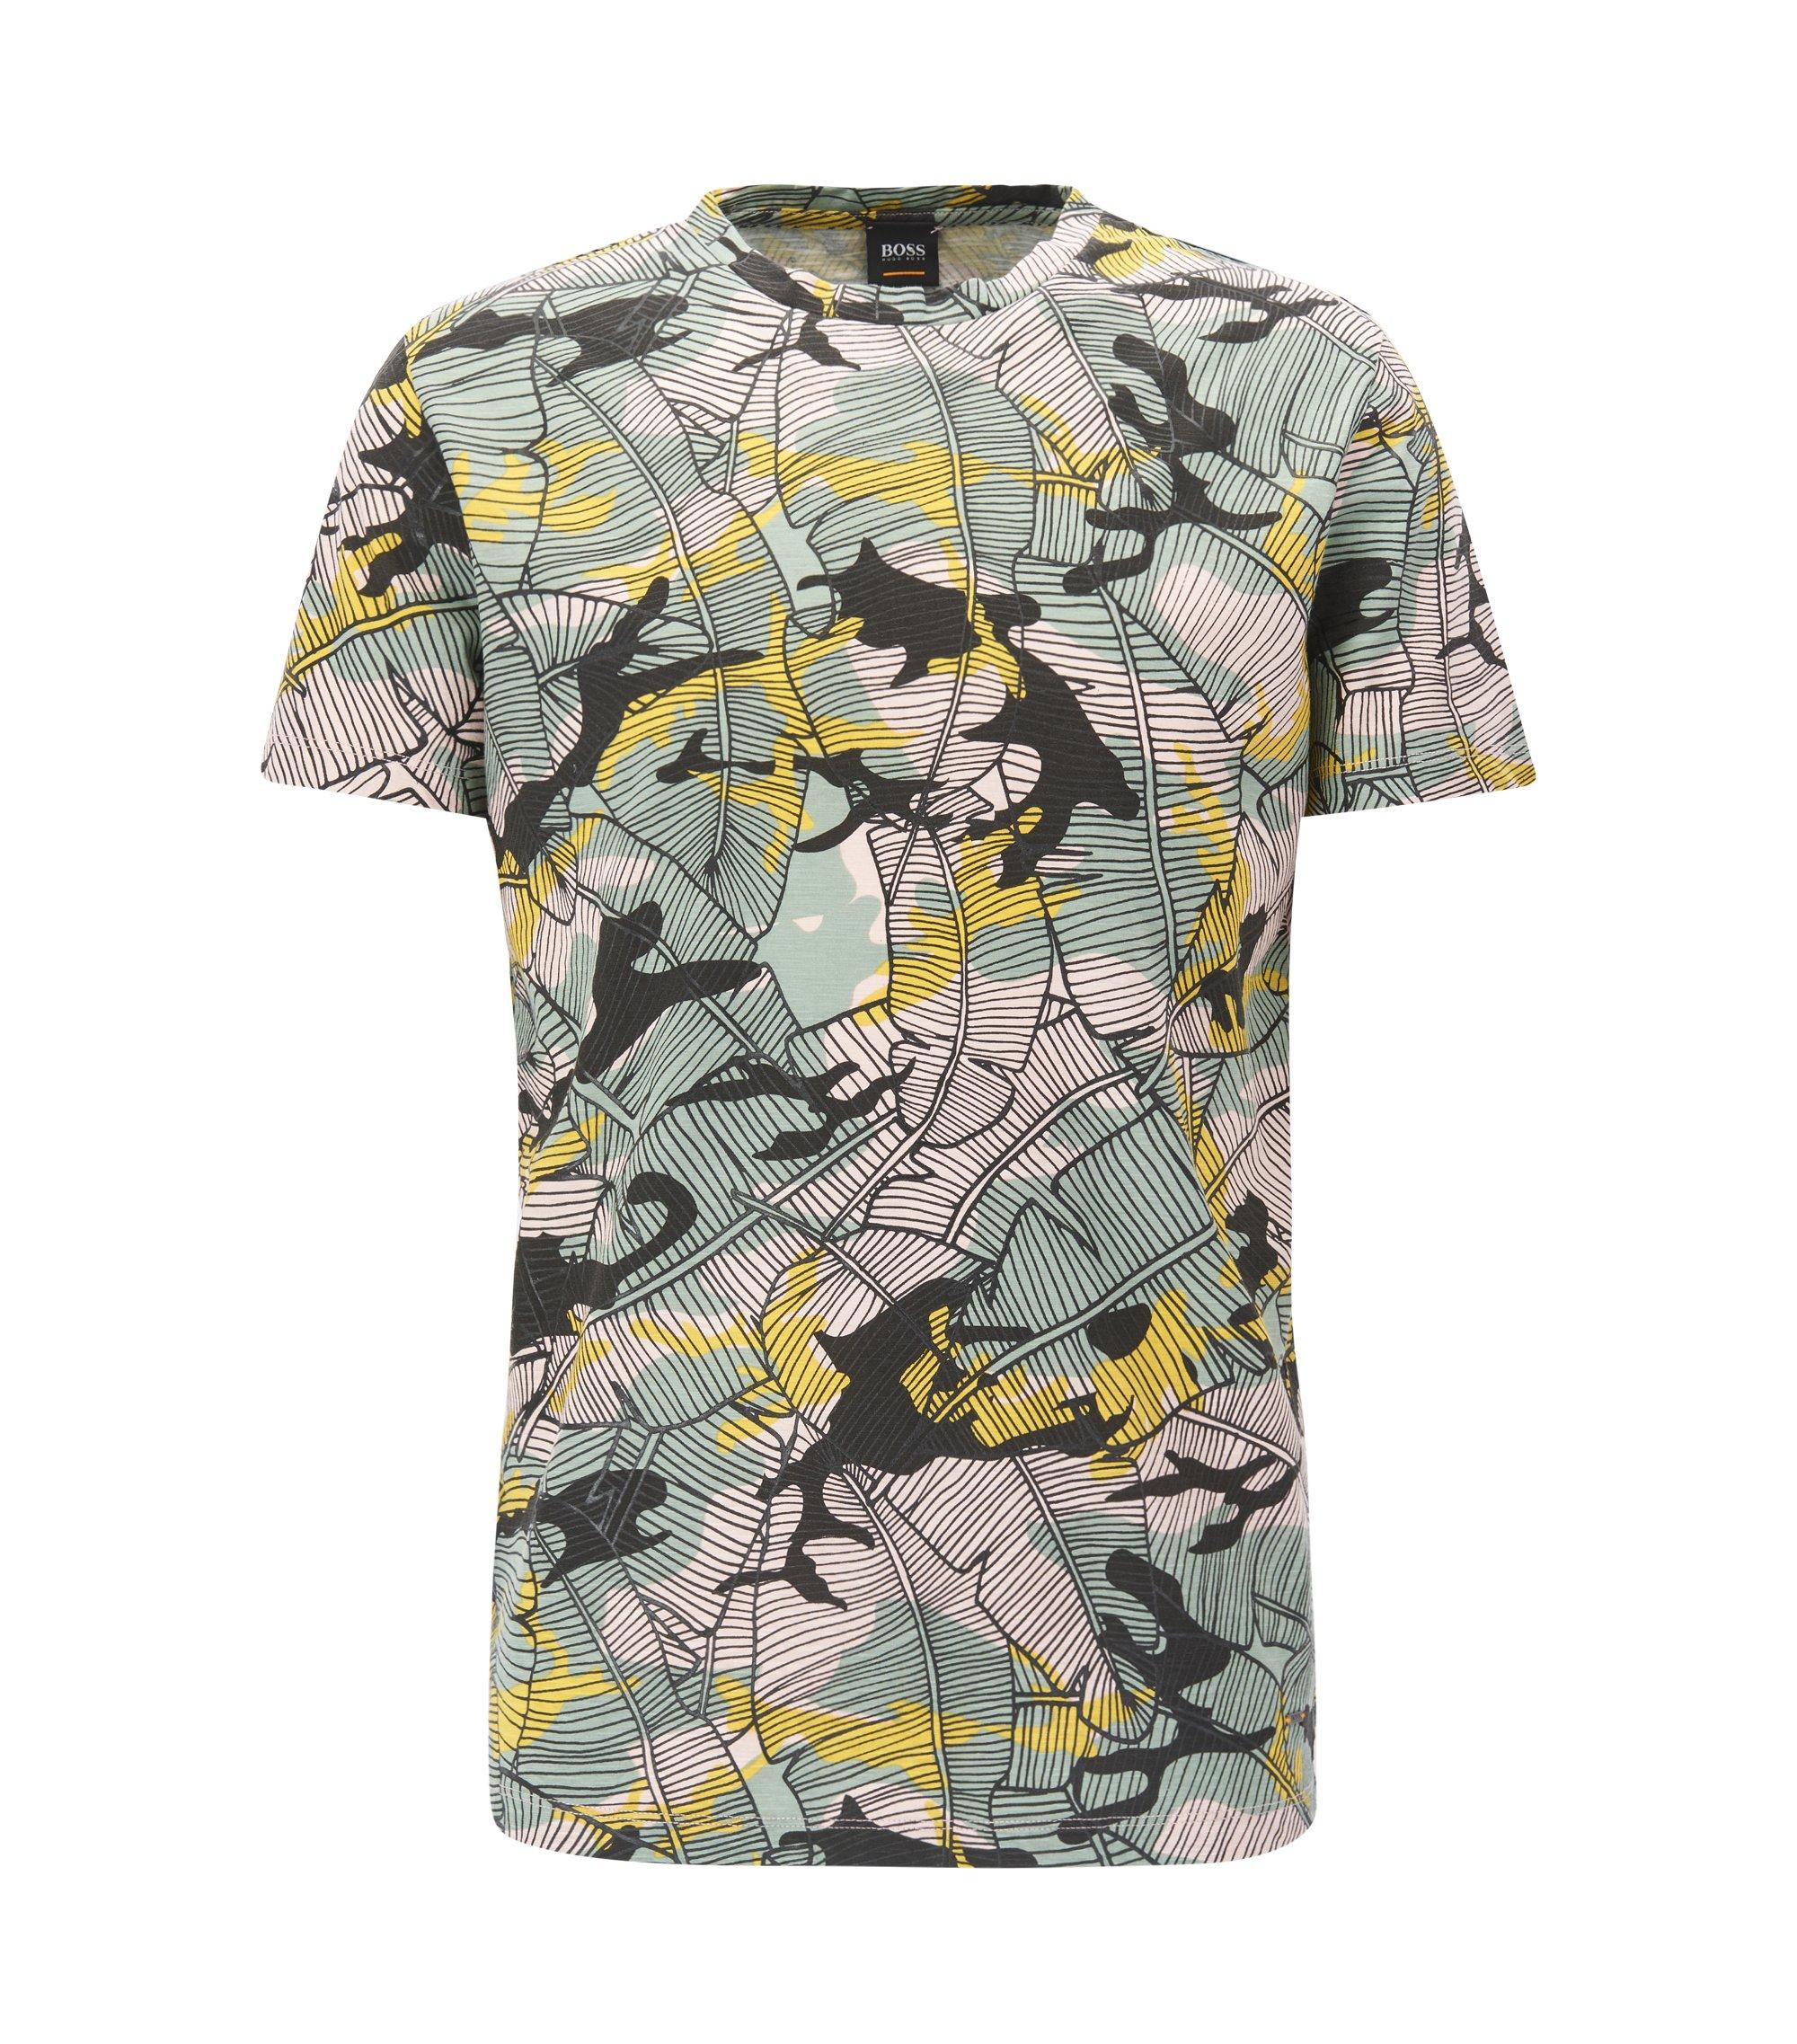 T-Shirt aus strukturiertem Baumwoll-Jersey mit Bananenblatt-Print, Gemustert